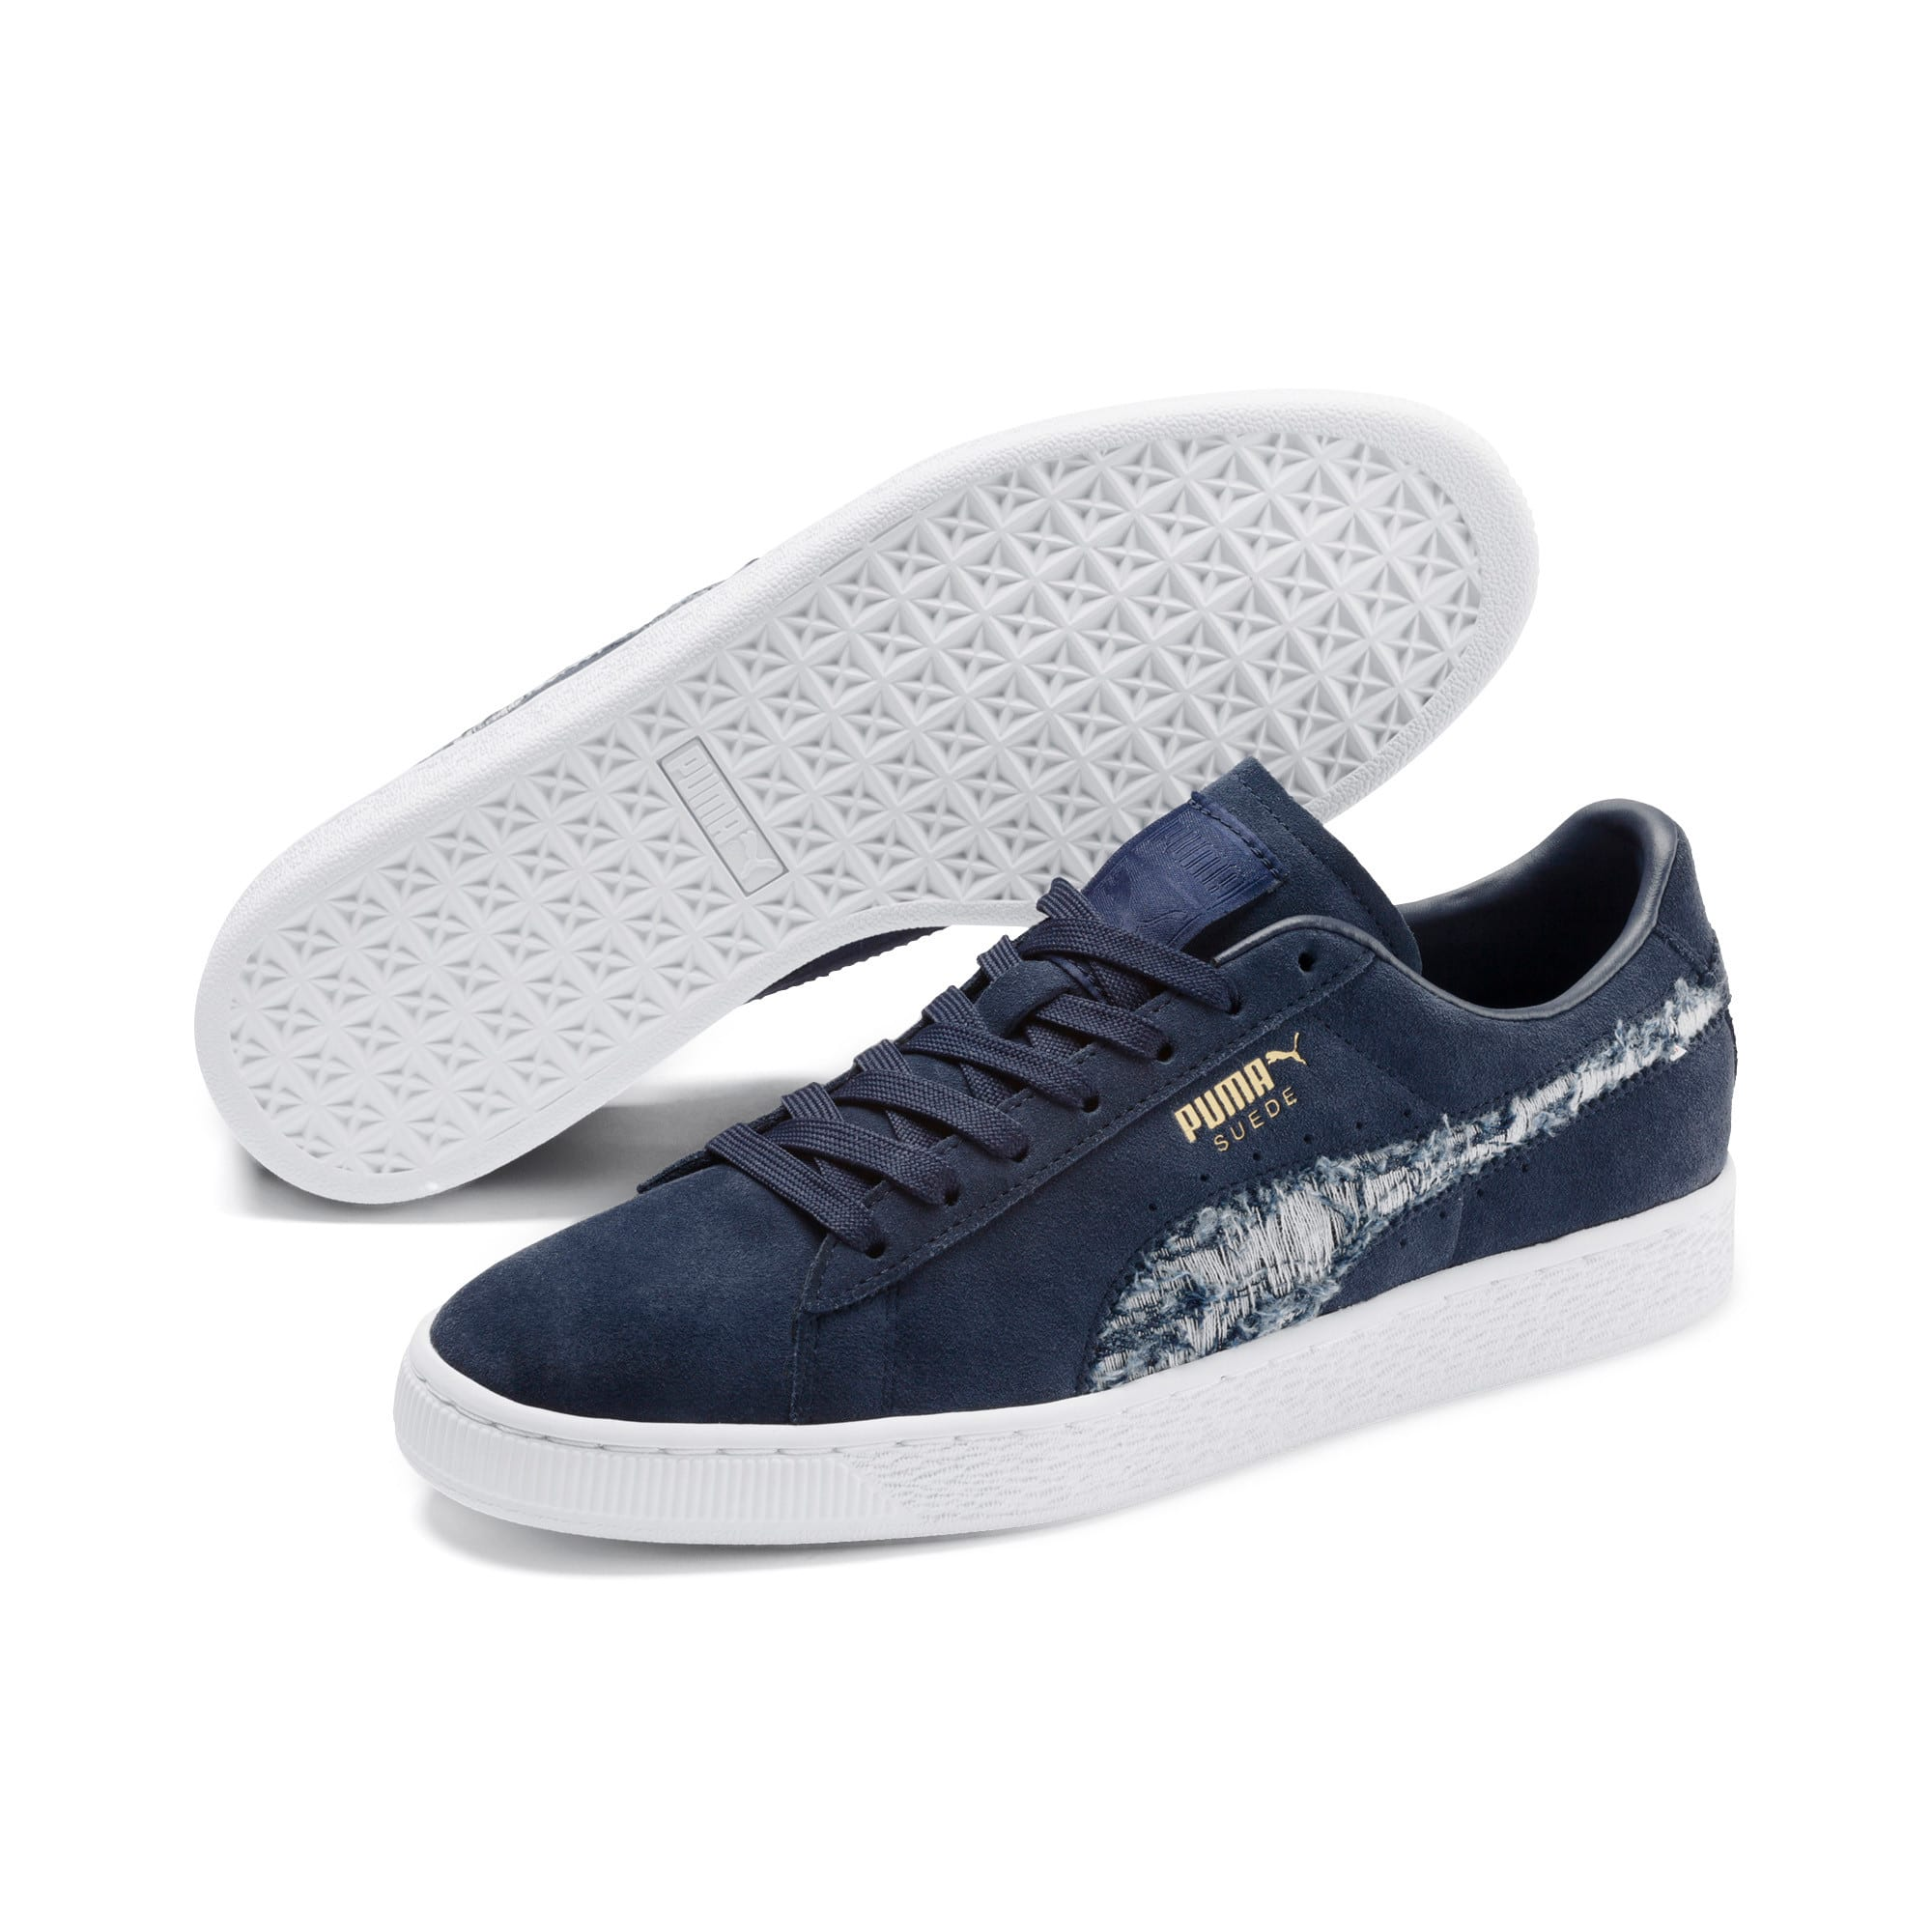 Thumbnail 2 of Suede Ripped Denim Sneakers, Peacoat-Peacoat-Puma White, medium